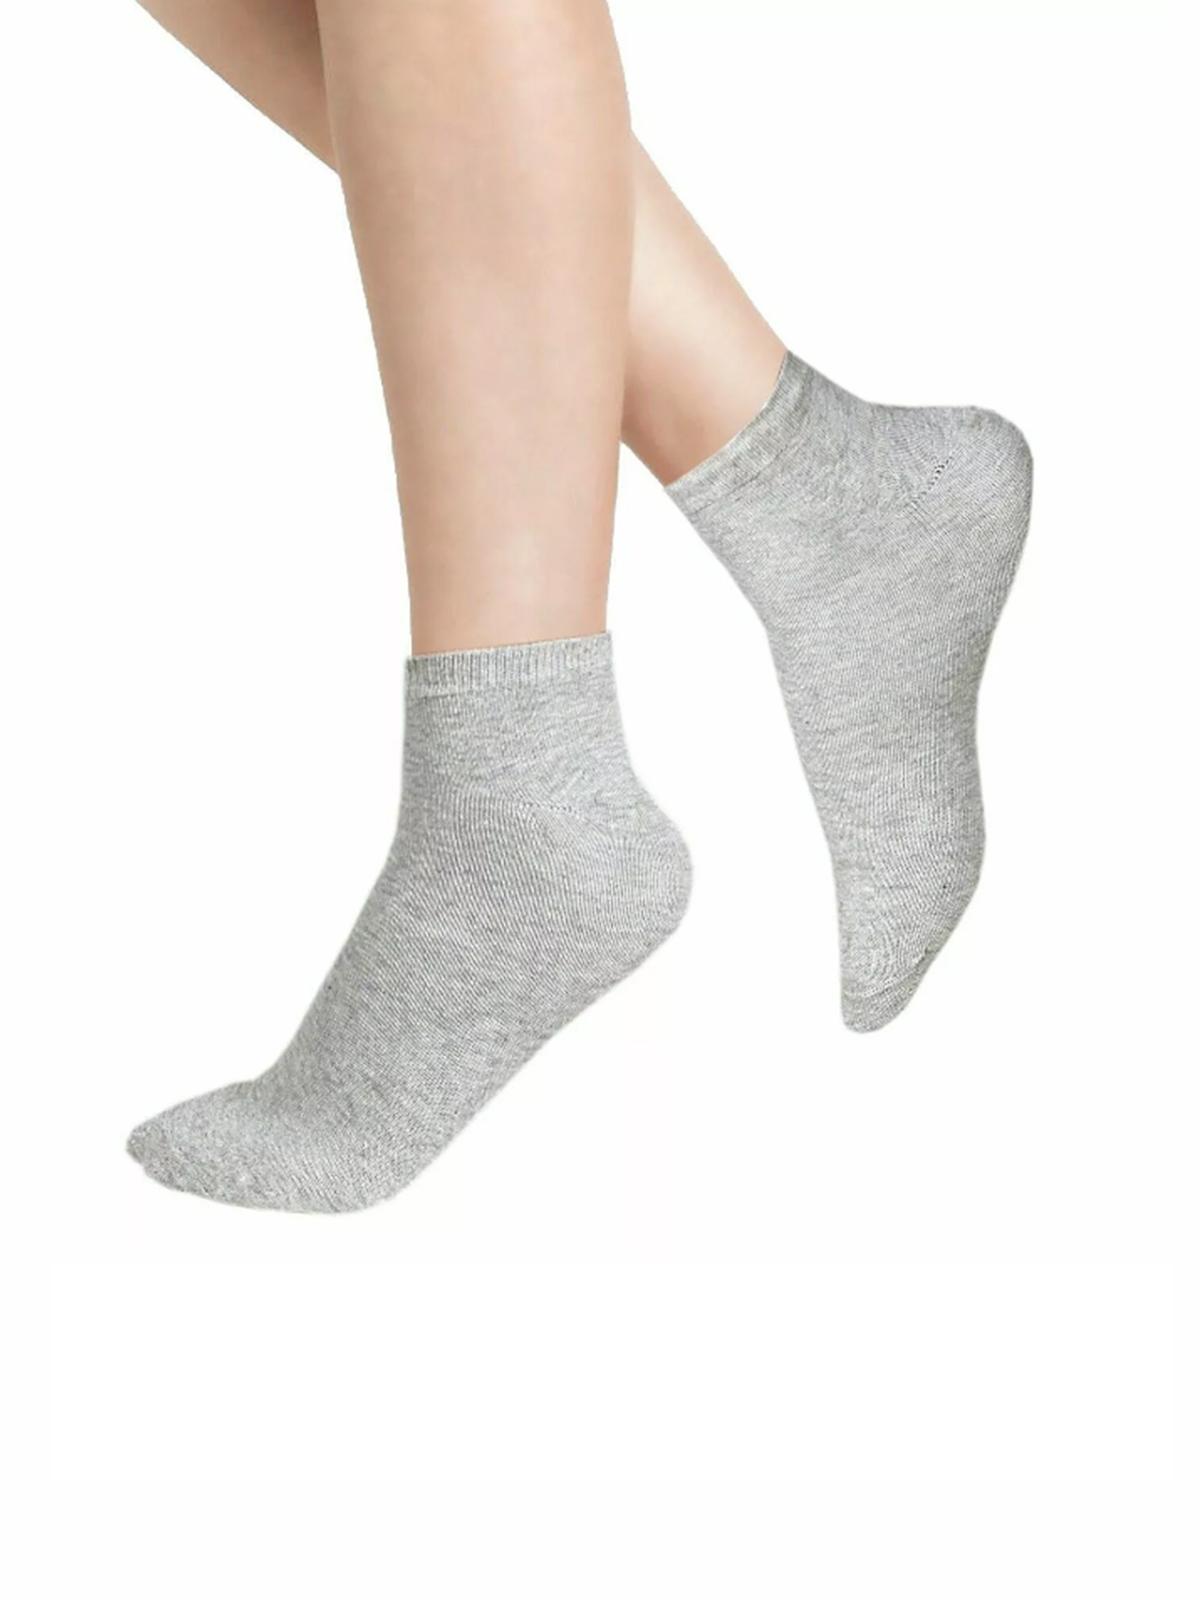 12 Pairs of Cotton Trainer Socks